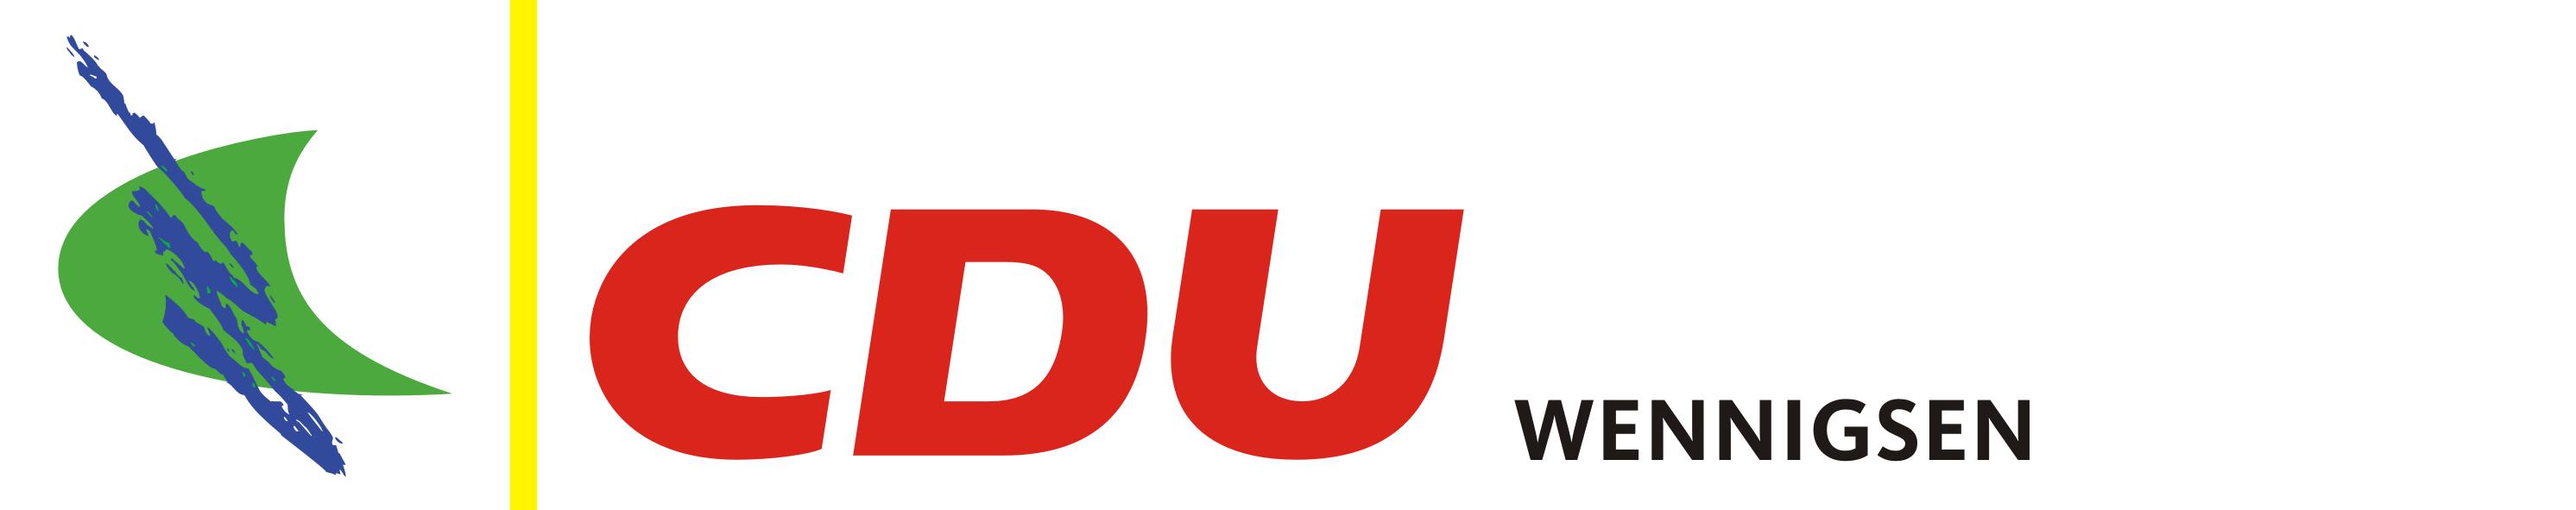 CDU Bredenbeck Logo